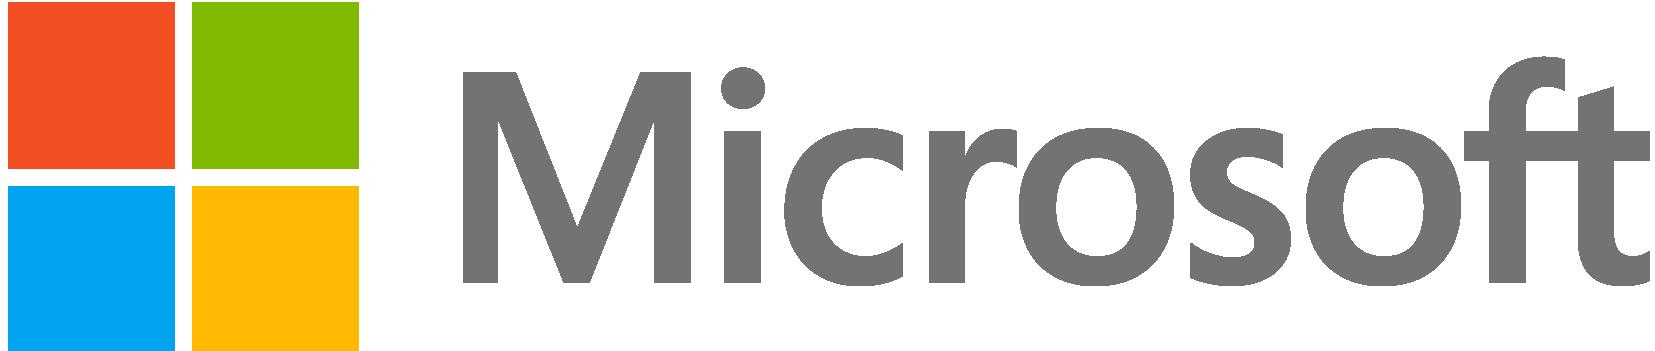 Microsoft - ICCP 2015 Silver Level Sponsor